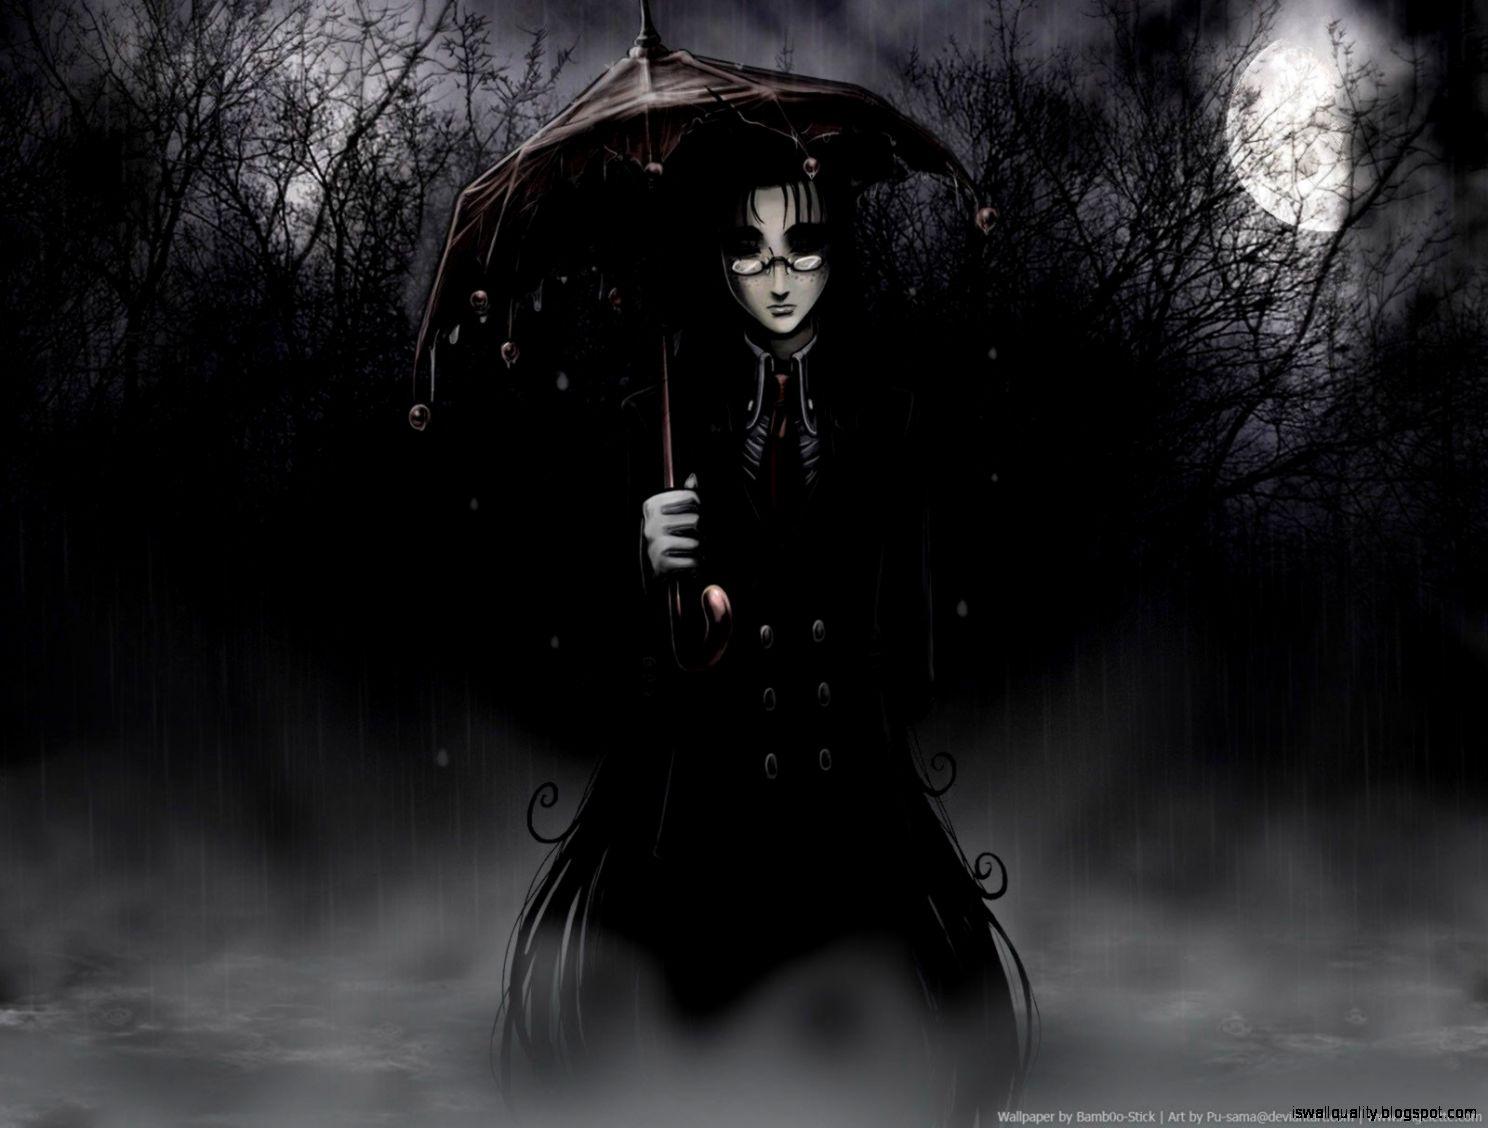 Dark Gothic Anime Girl - Gothic Anime Backgrounds - HD Wallpaper